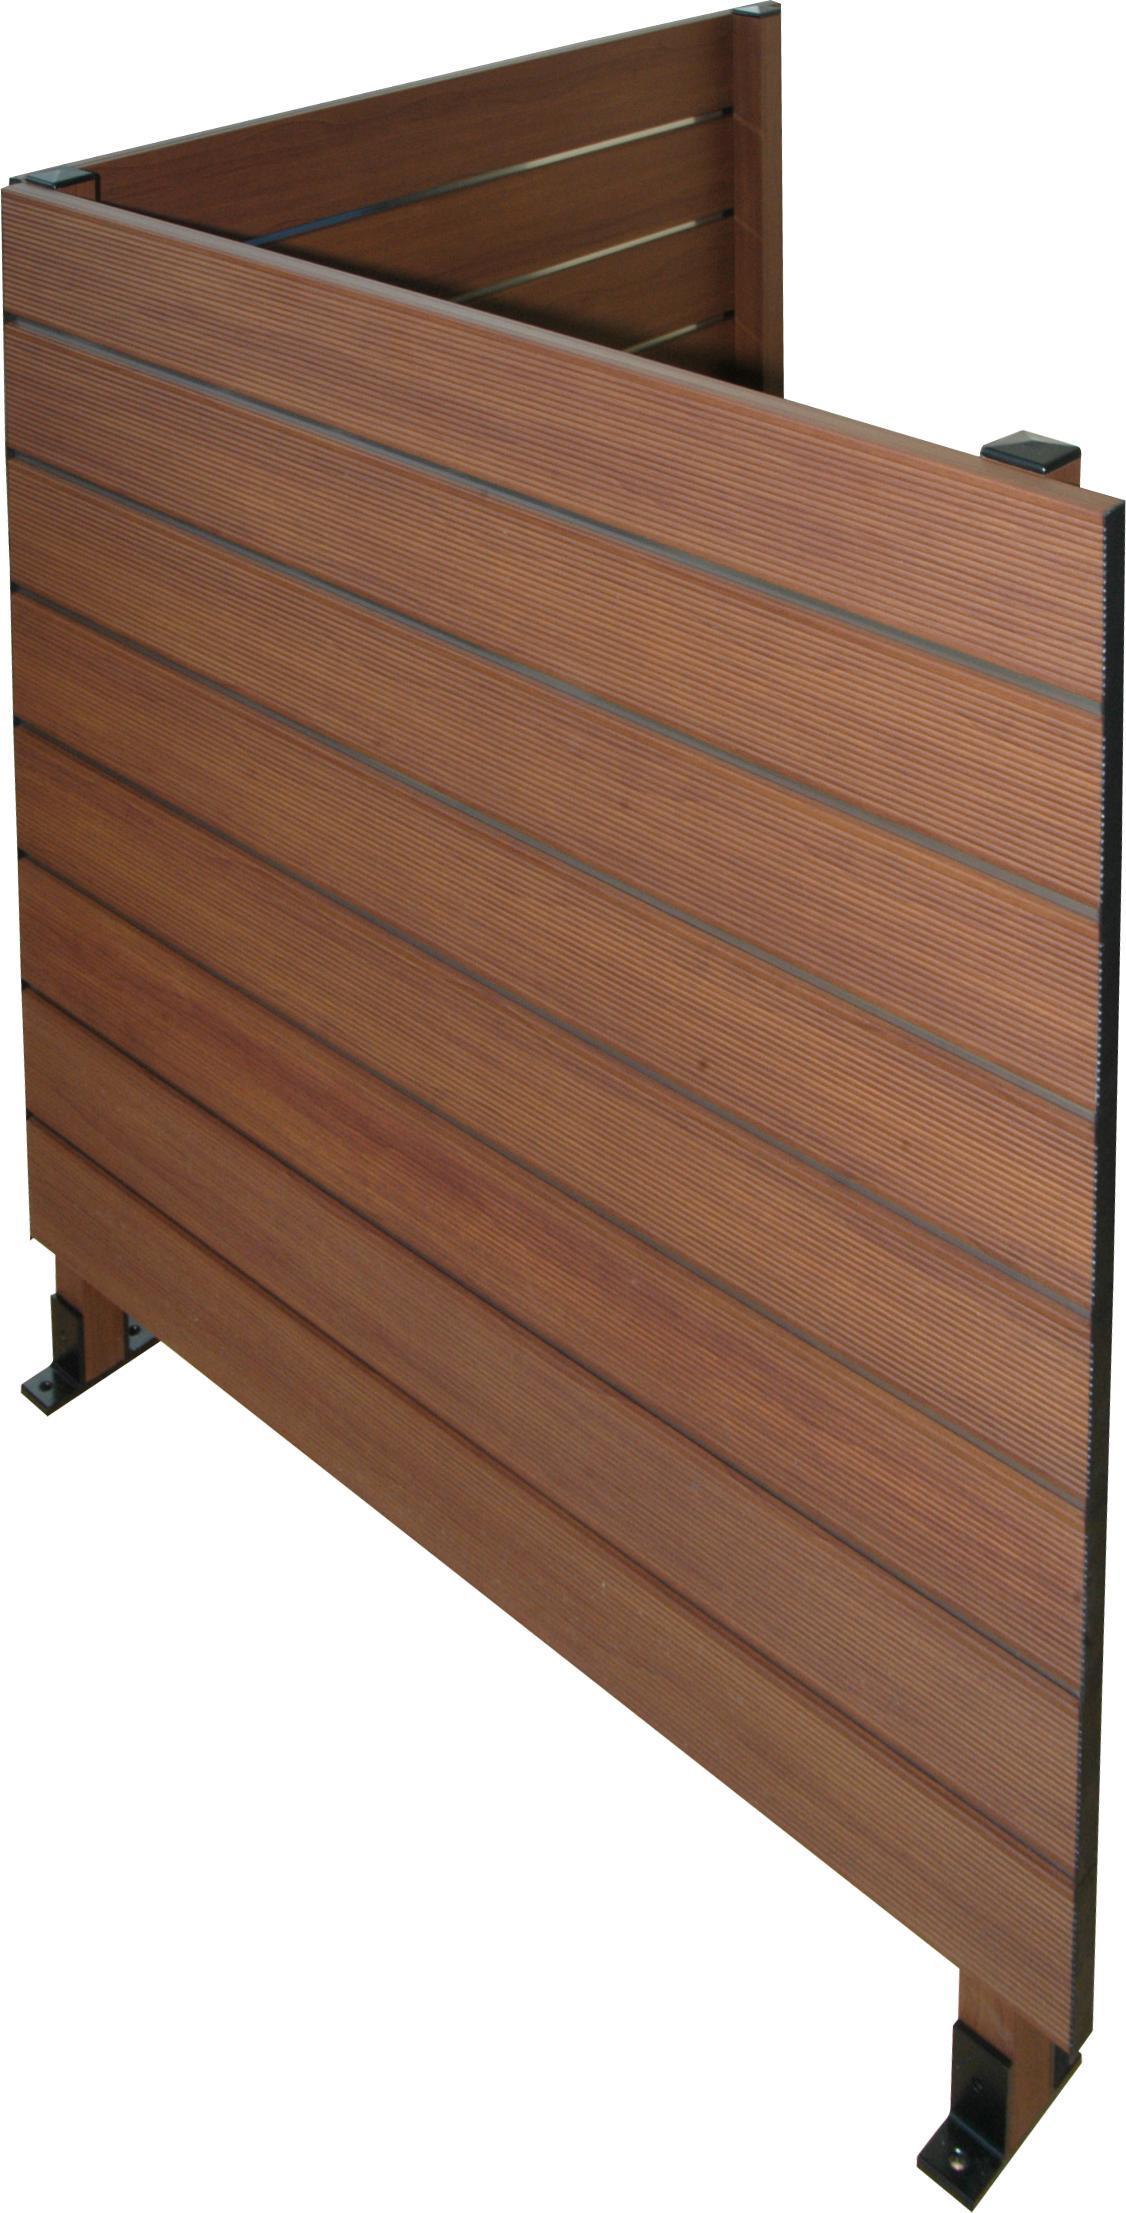 Vallas modernas con perfiler a de aluminio productos y - Imitacion madera para fachadas ...